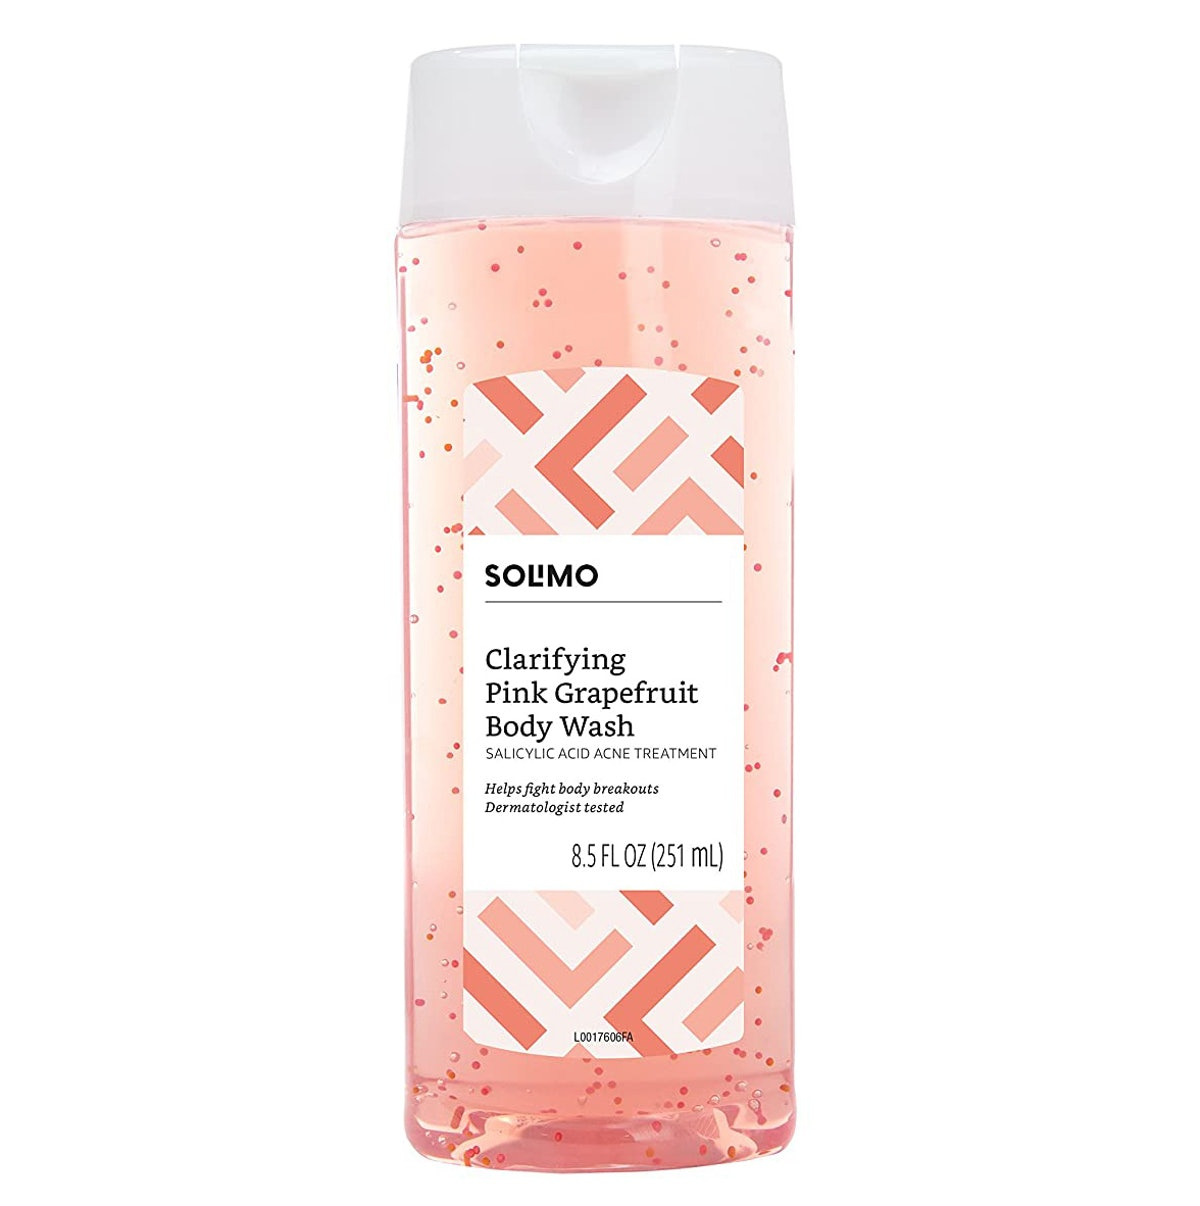 Solimo Clarifying Pink Grapefruit Body Wash